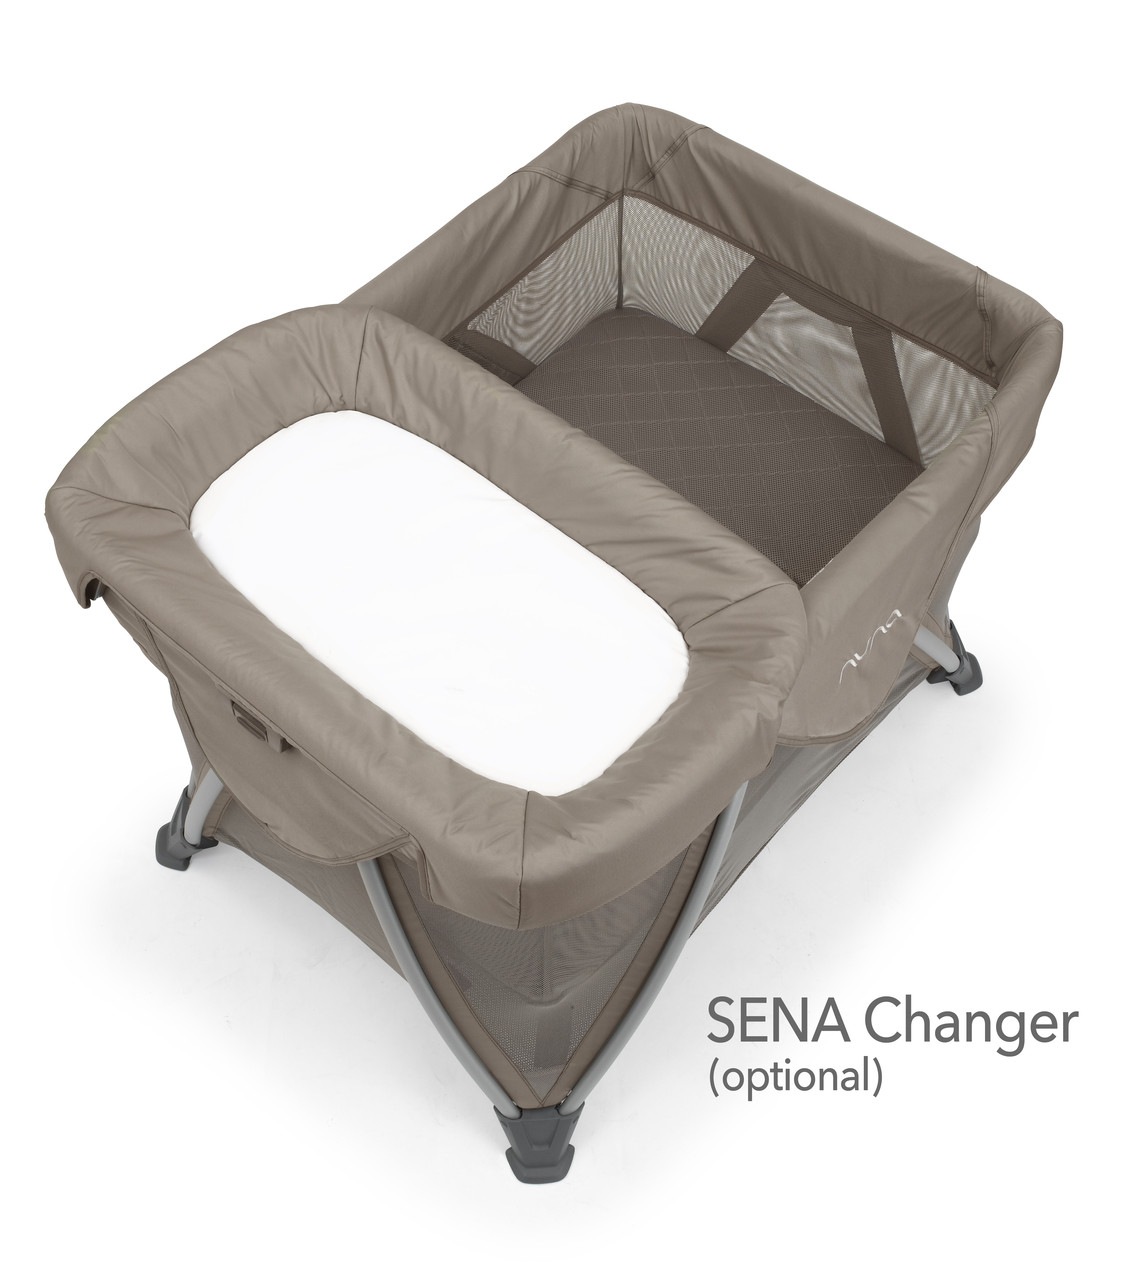 Nuna 174 Sena Aire Play Yard Bassinet Includes Organic